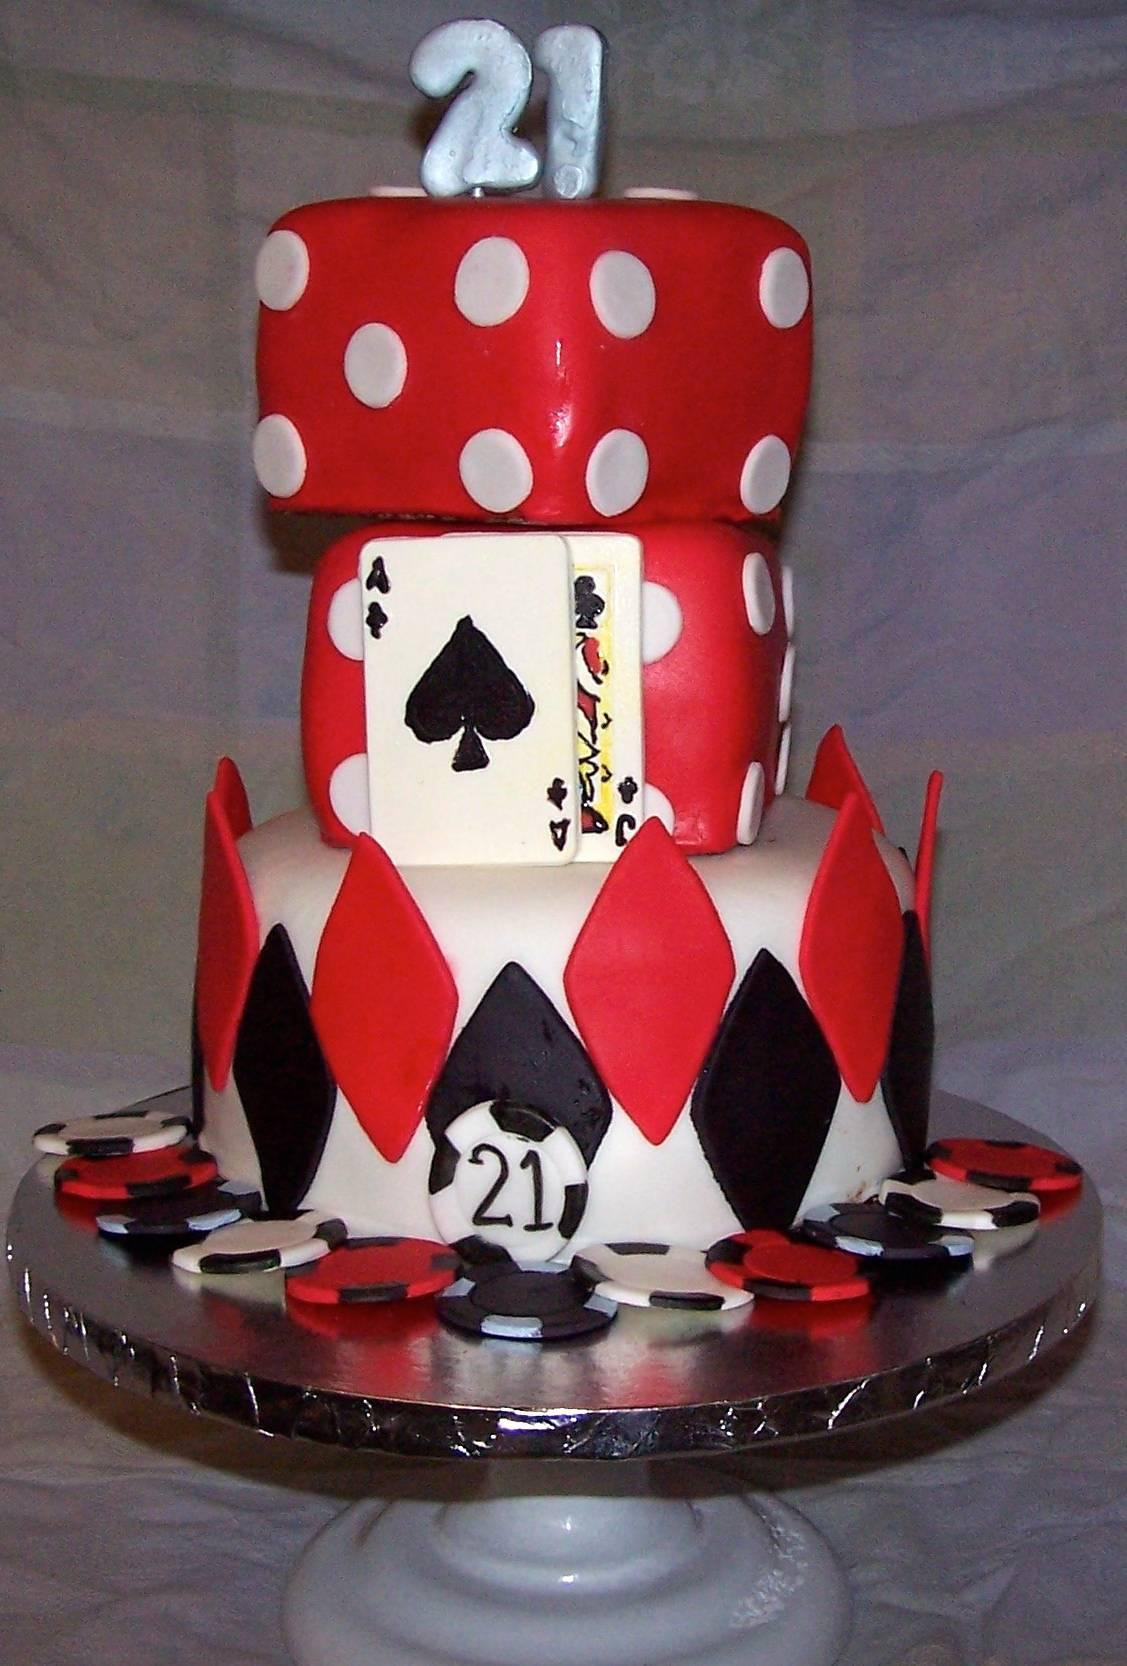 21st Birthday/ Viva Las Vegas